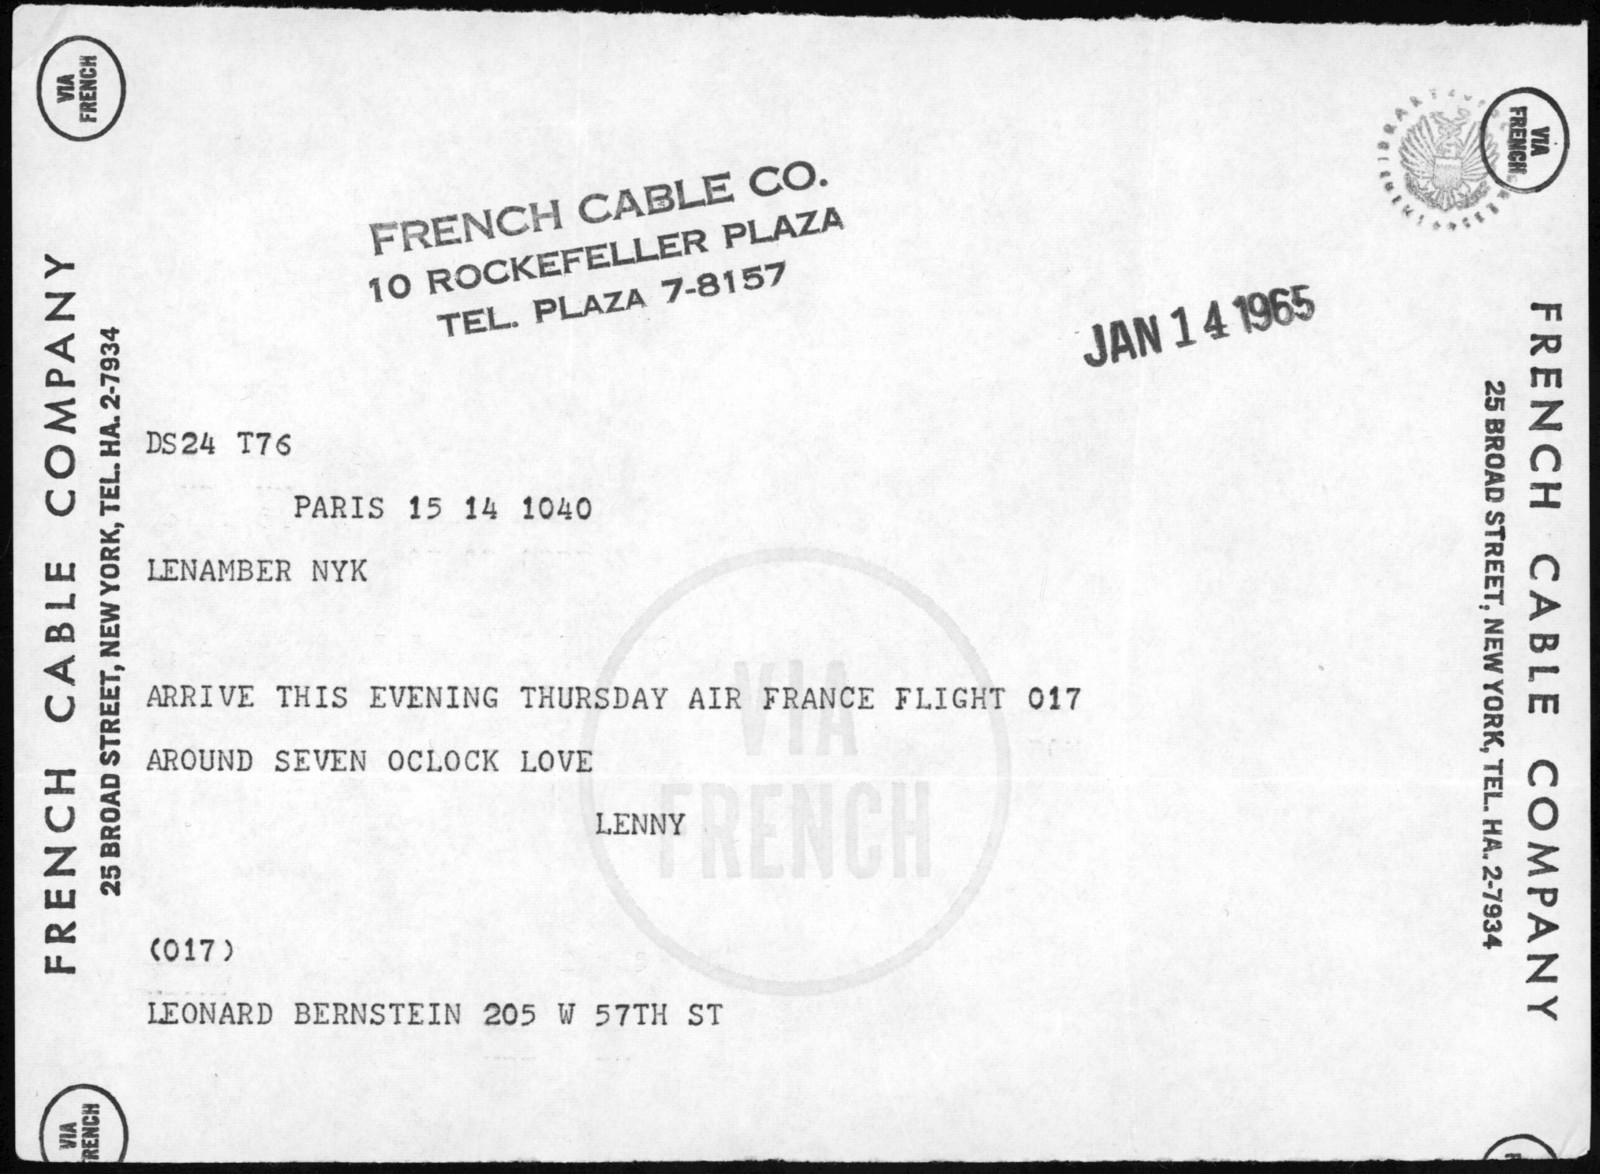 Letter from Leonard Bernstein to Helen Coates, January 14, 1965